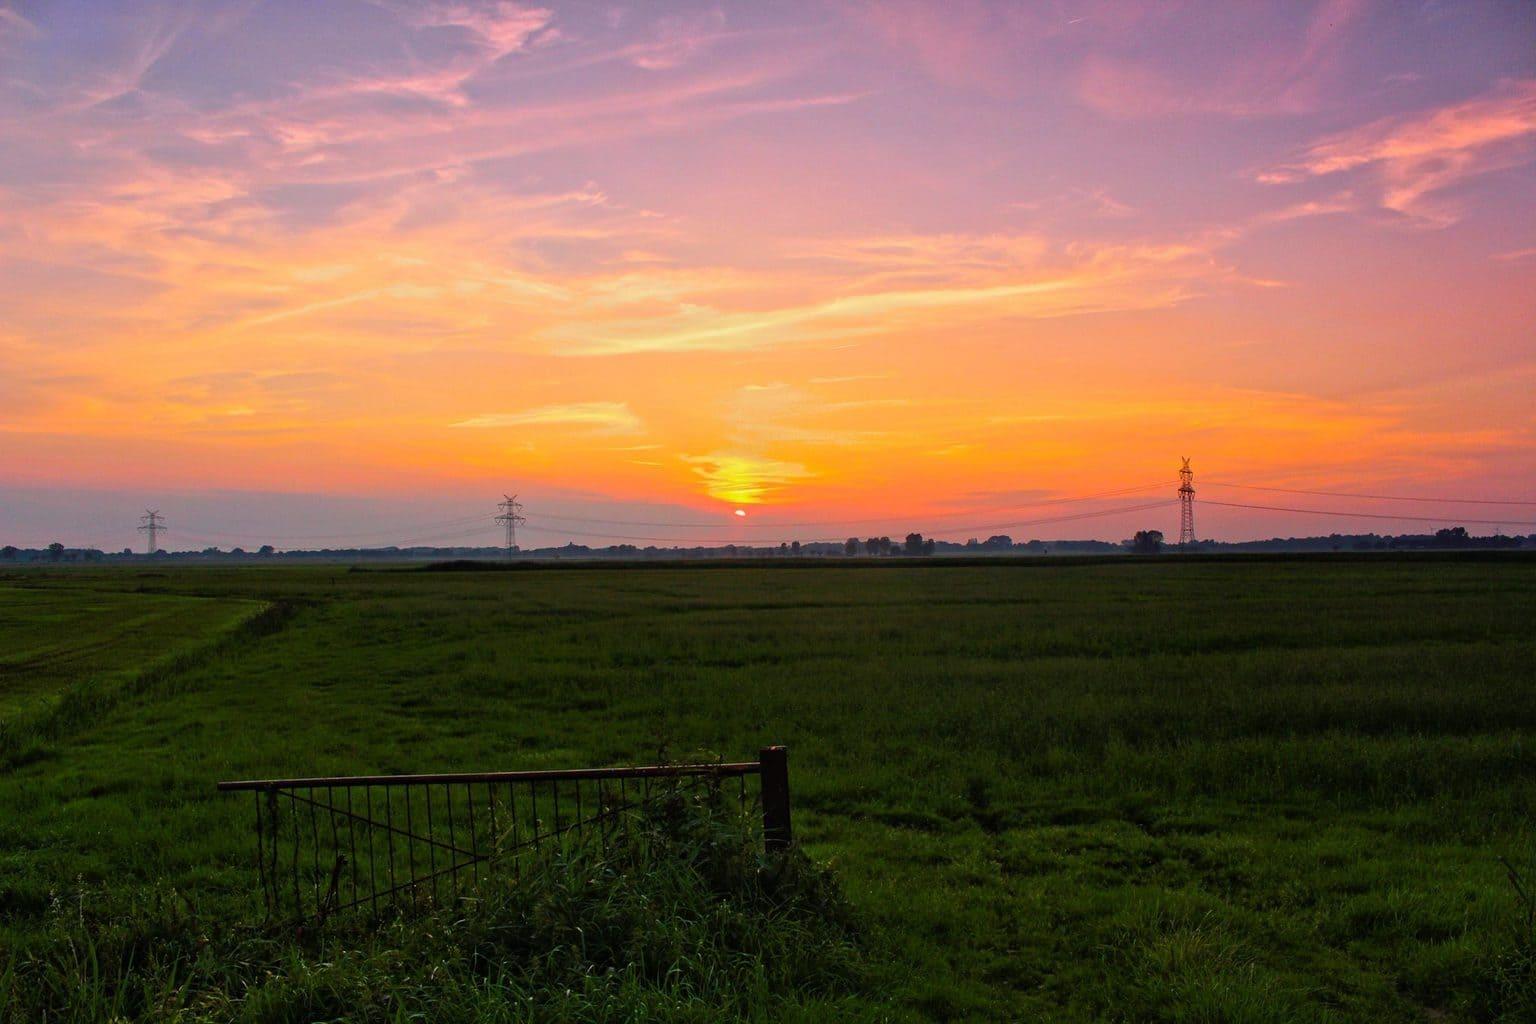 Sunset in northwest Germany, 19.08.2015